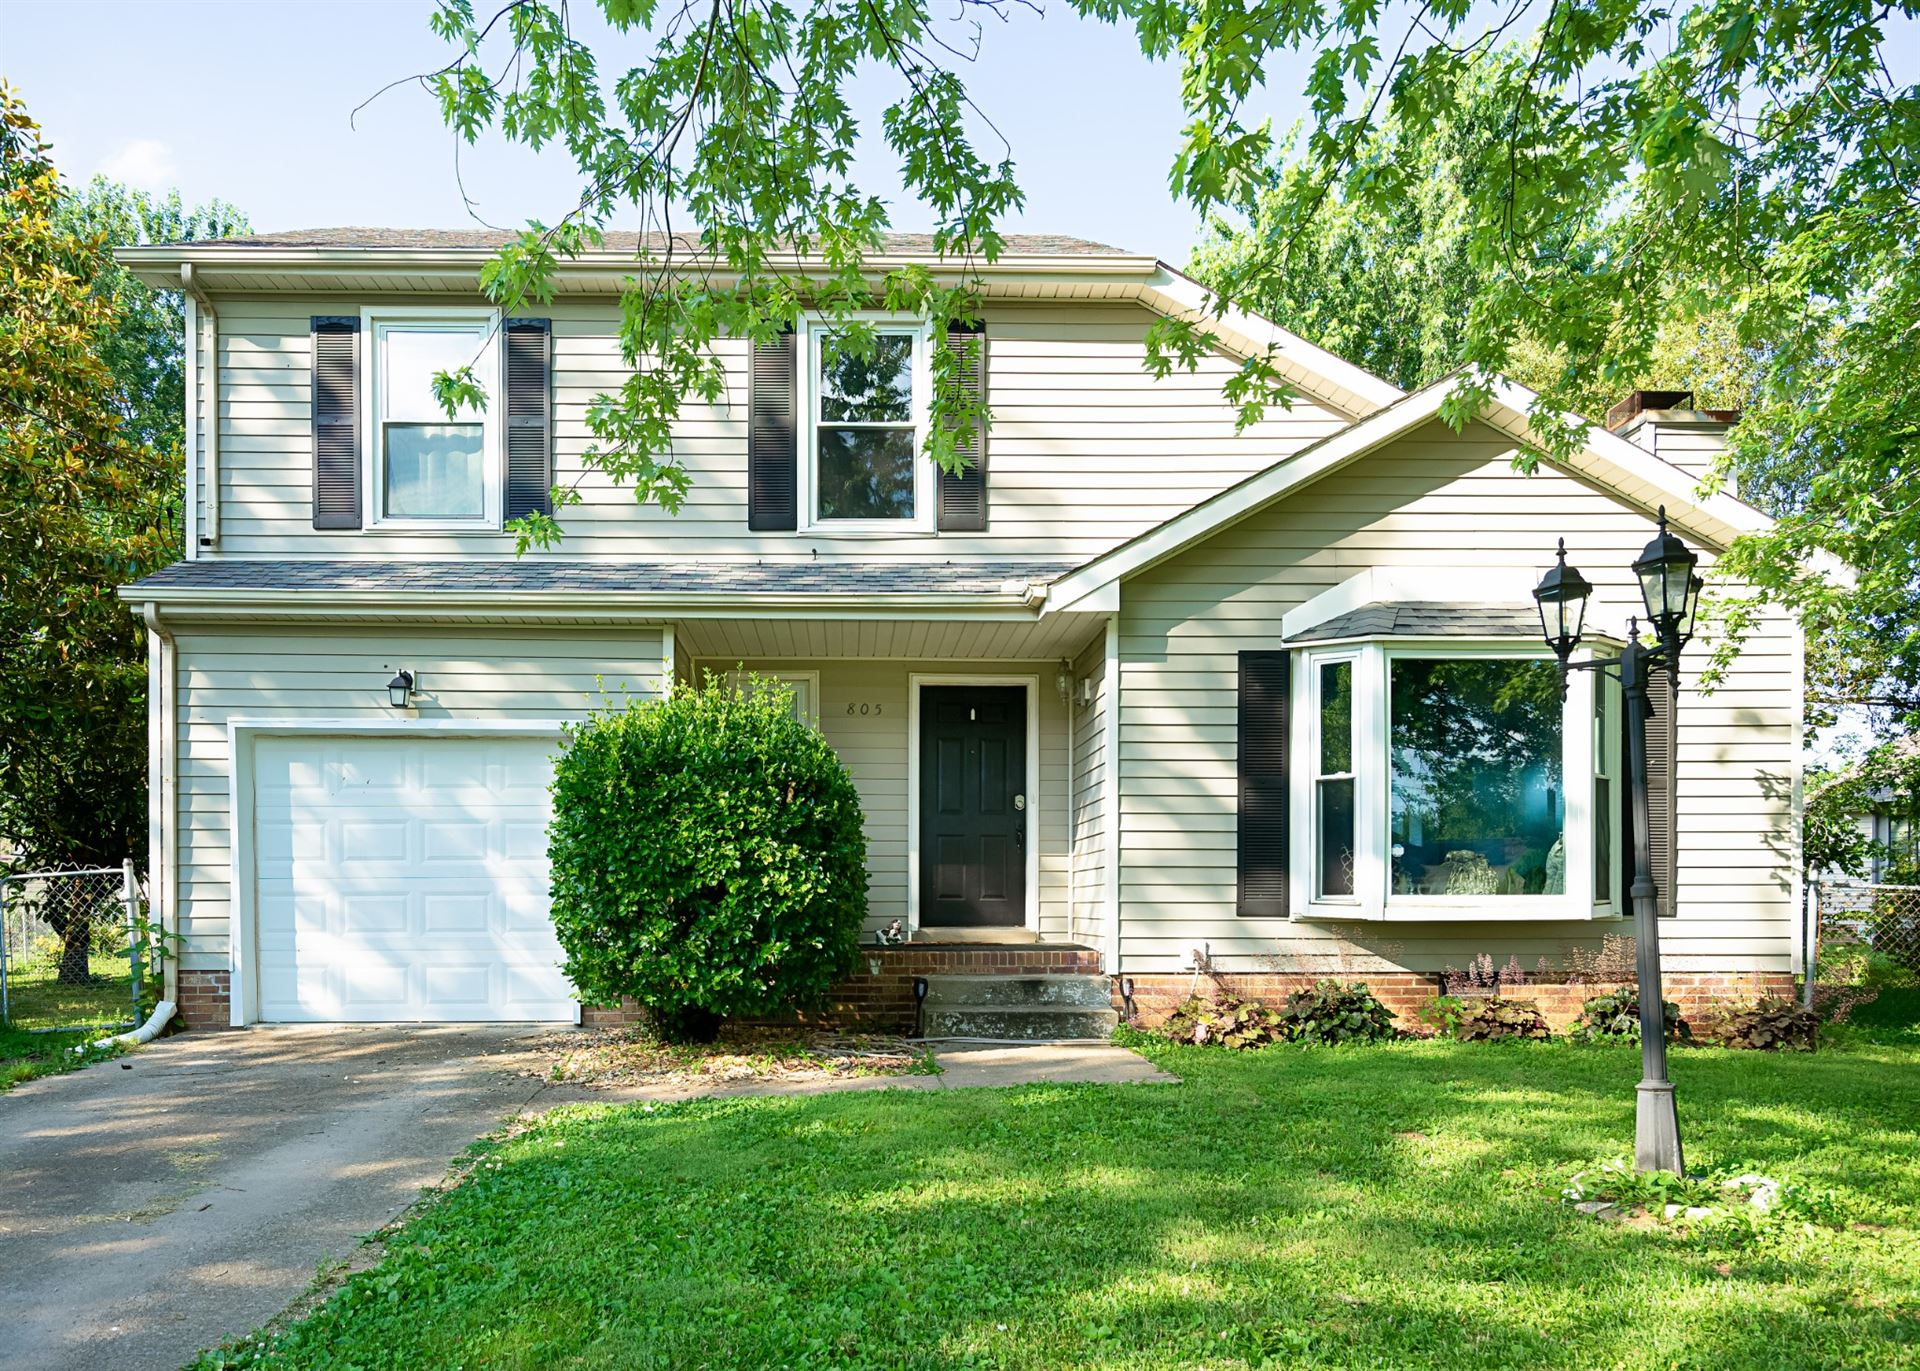 805 Mallard Ct, Clarksville, TN 37042 - MLS#: 2263839